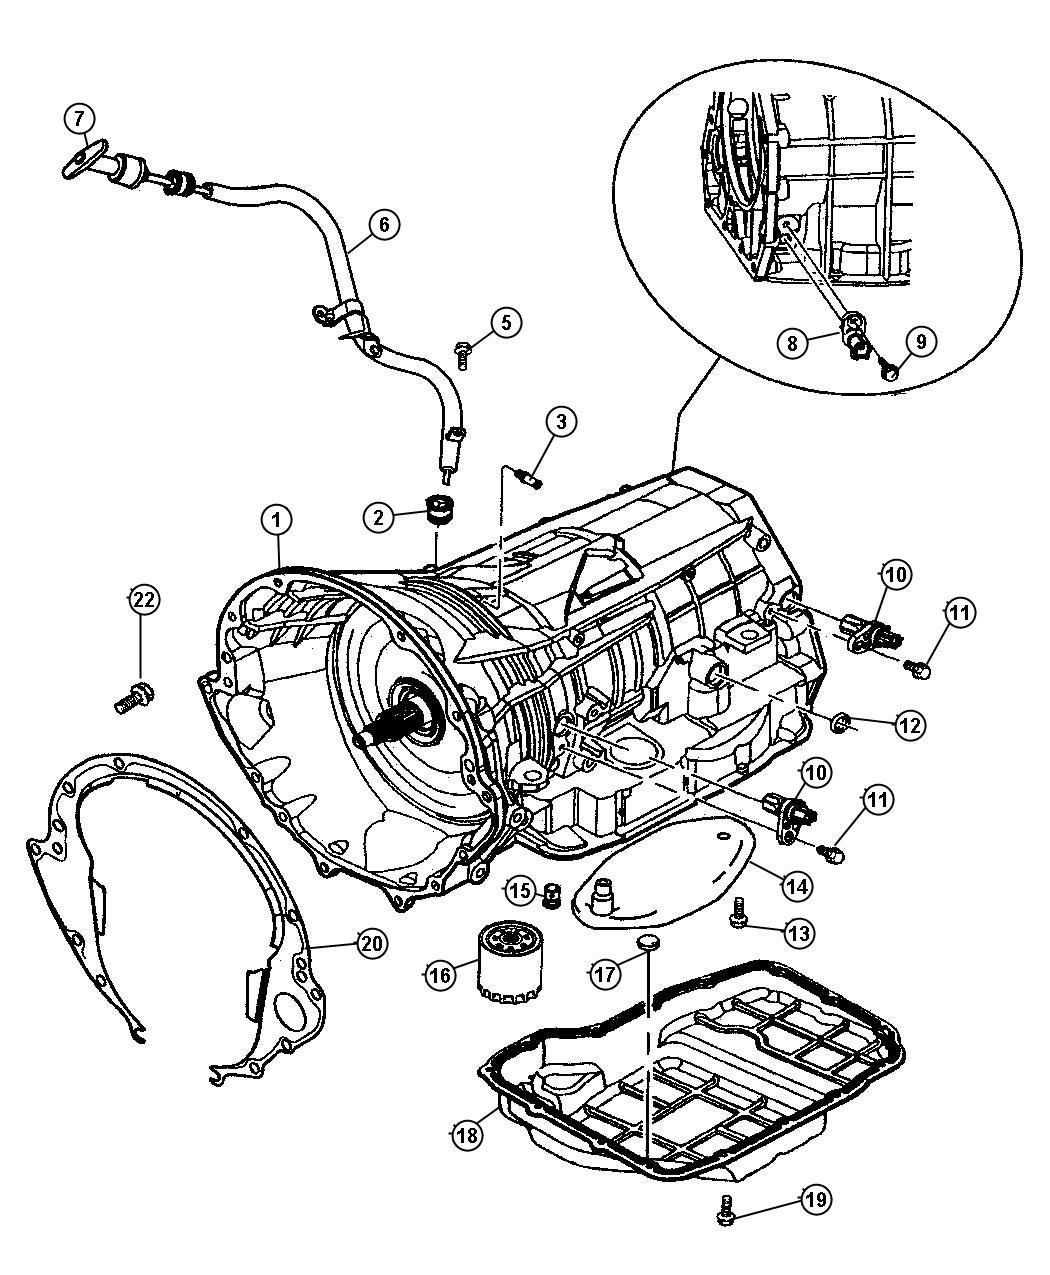 Dodge Dakota Case Amp Related Parts 45rfe